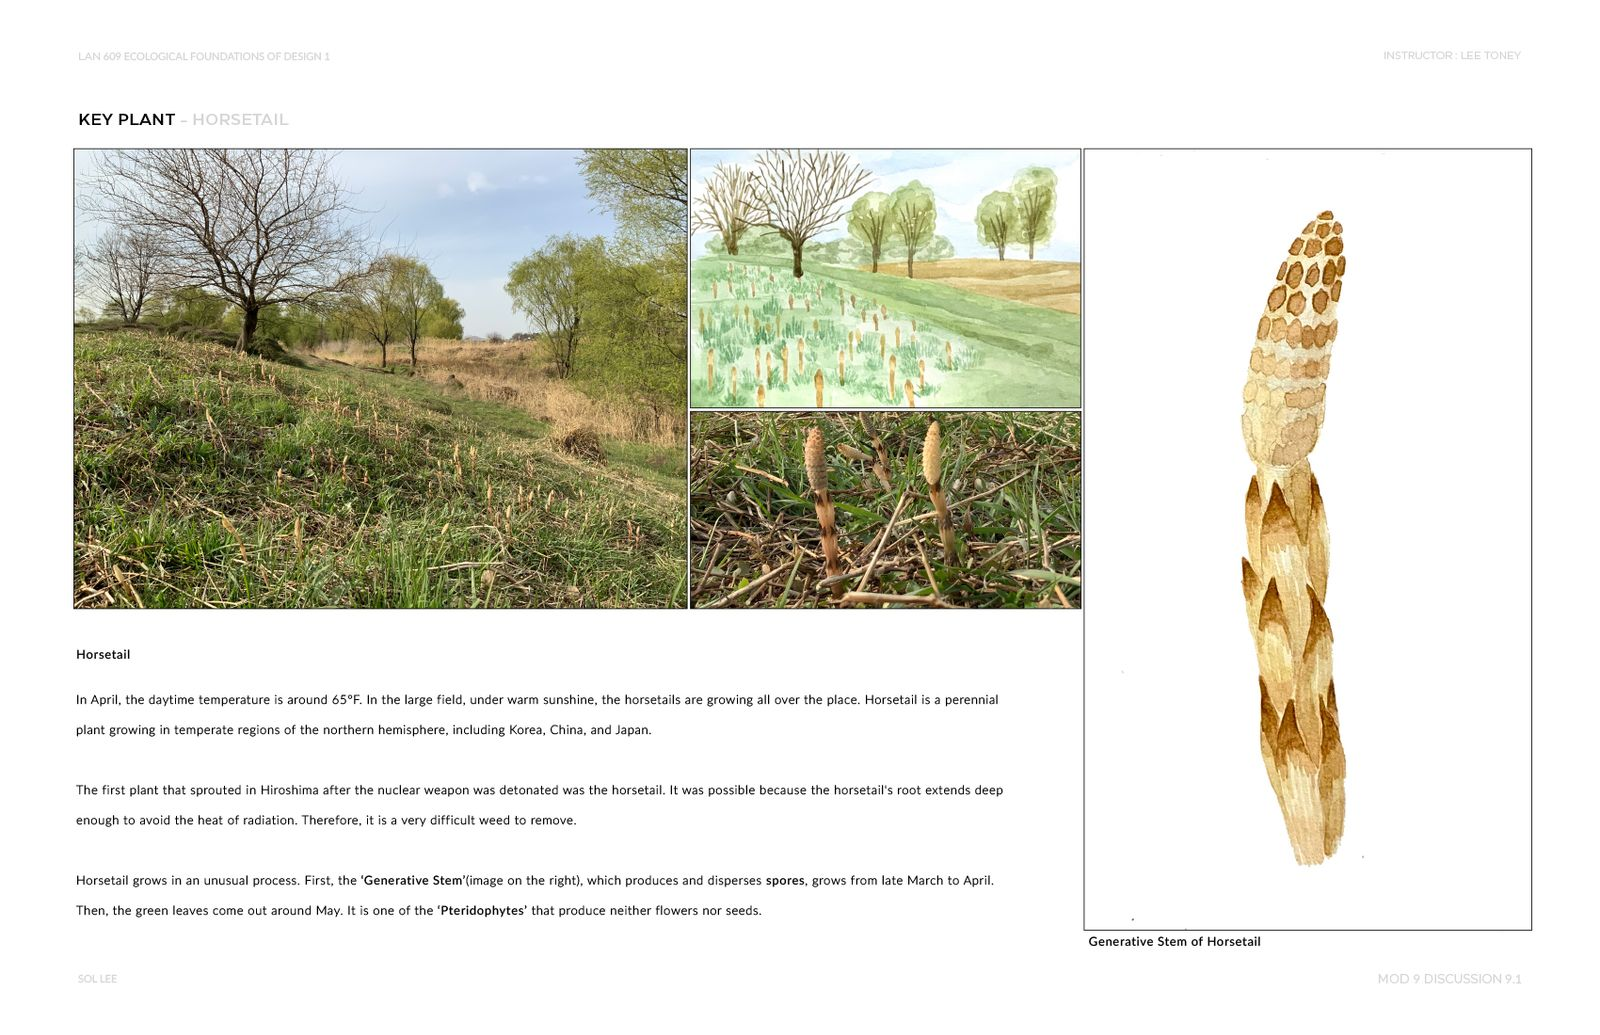 Gangseo Wet Ecology Park - Key Plant - Horsetail